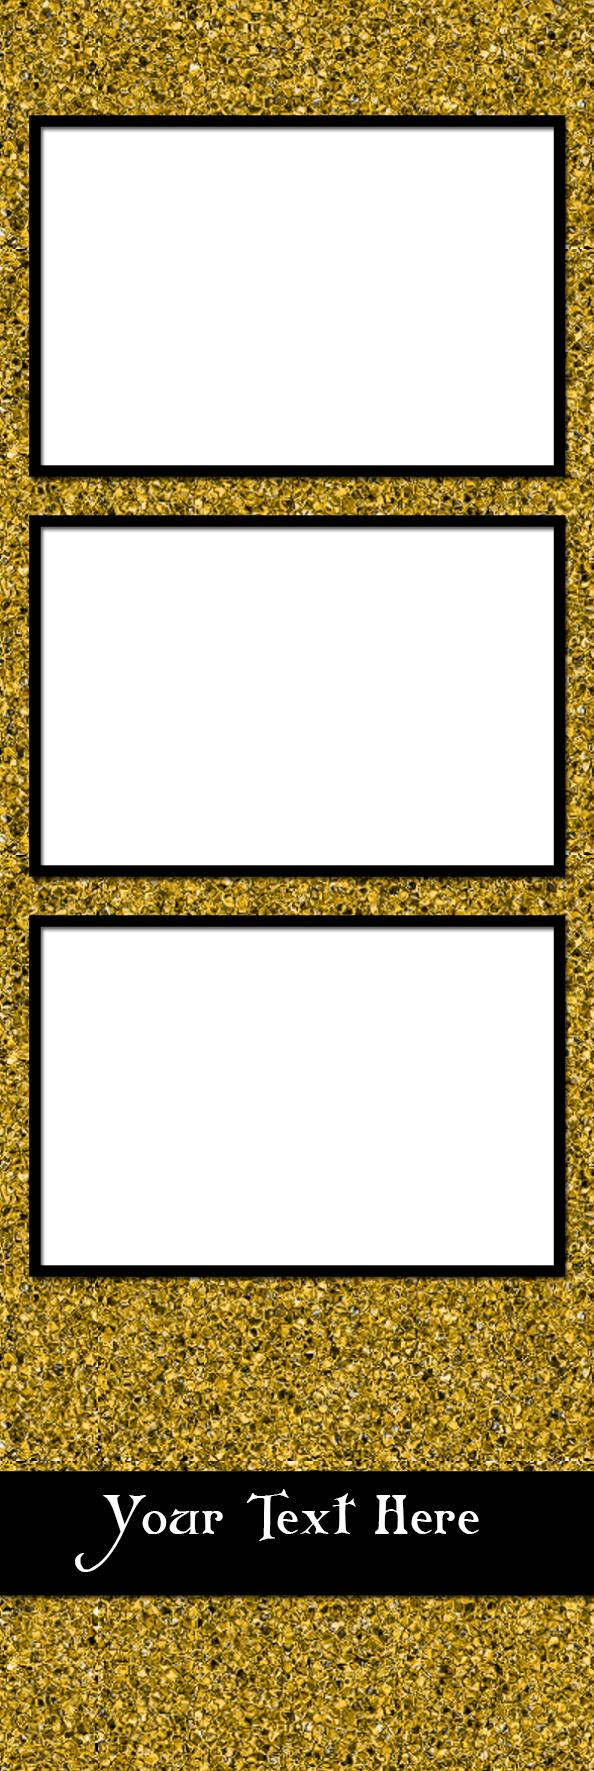 Texture_Glitter-V-6P4.jpg